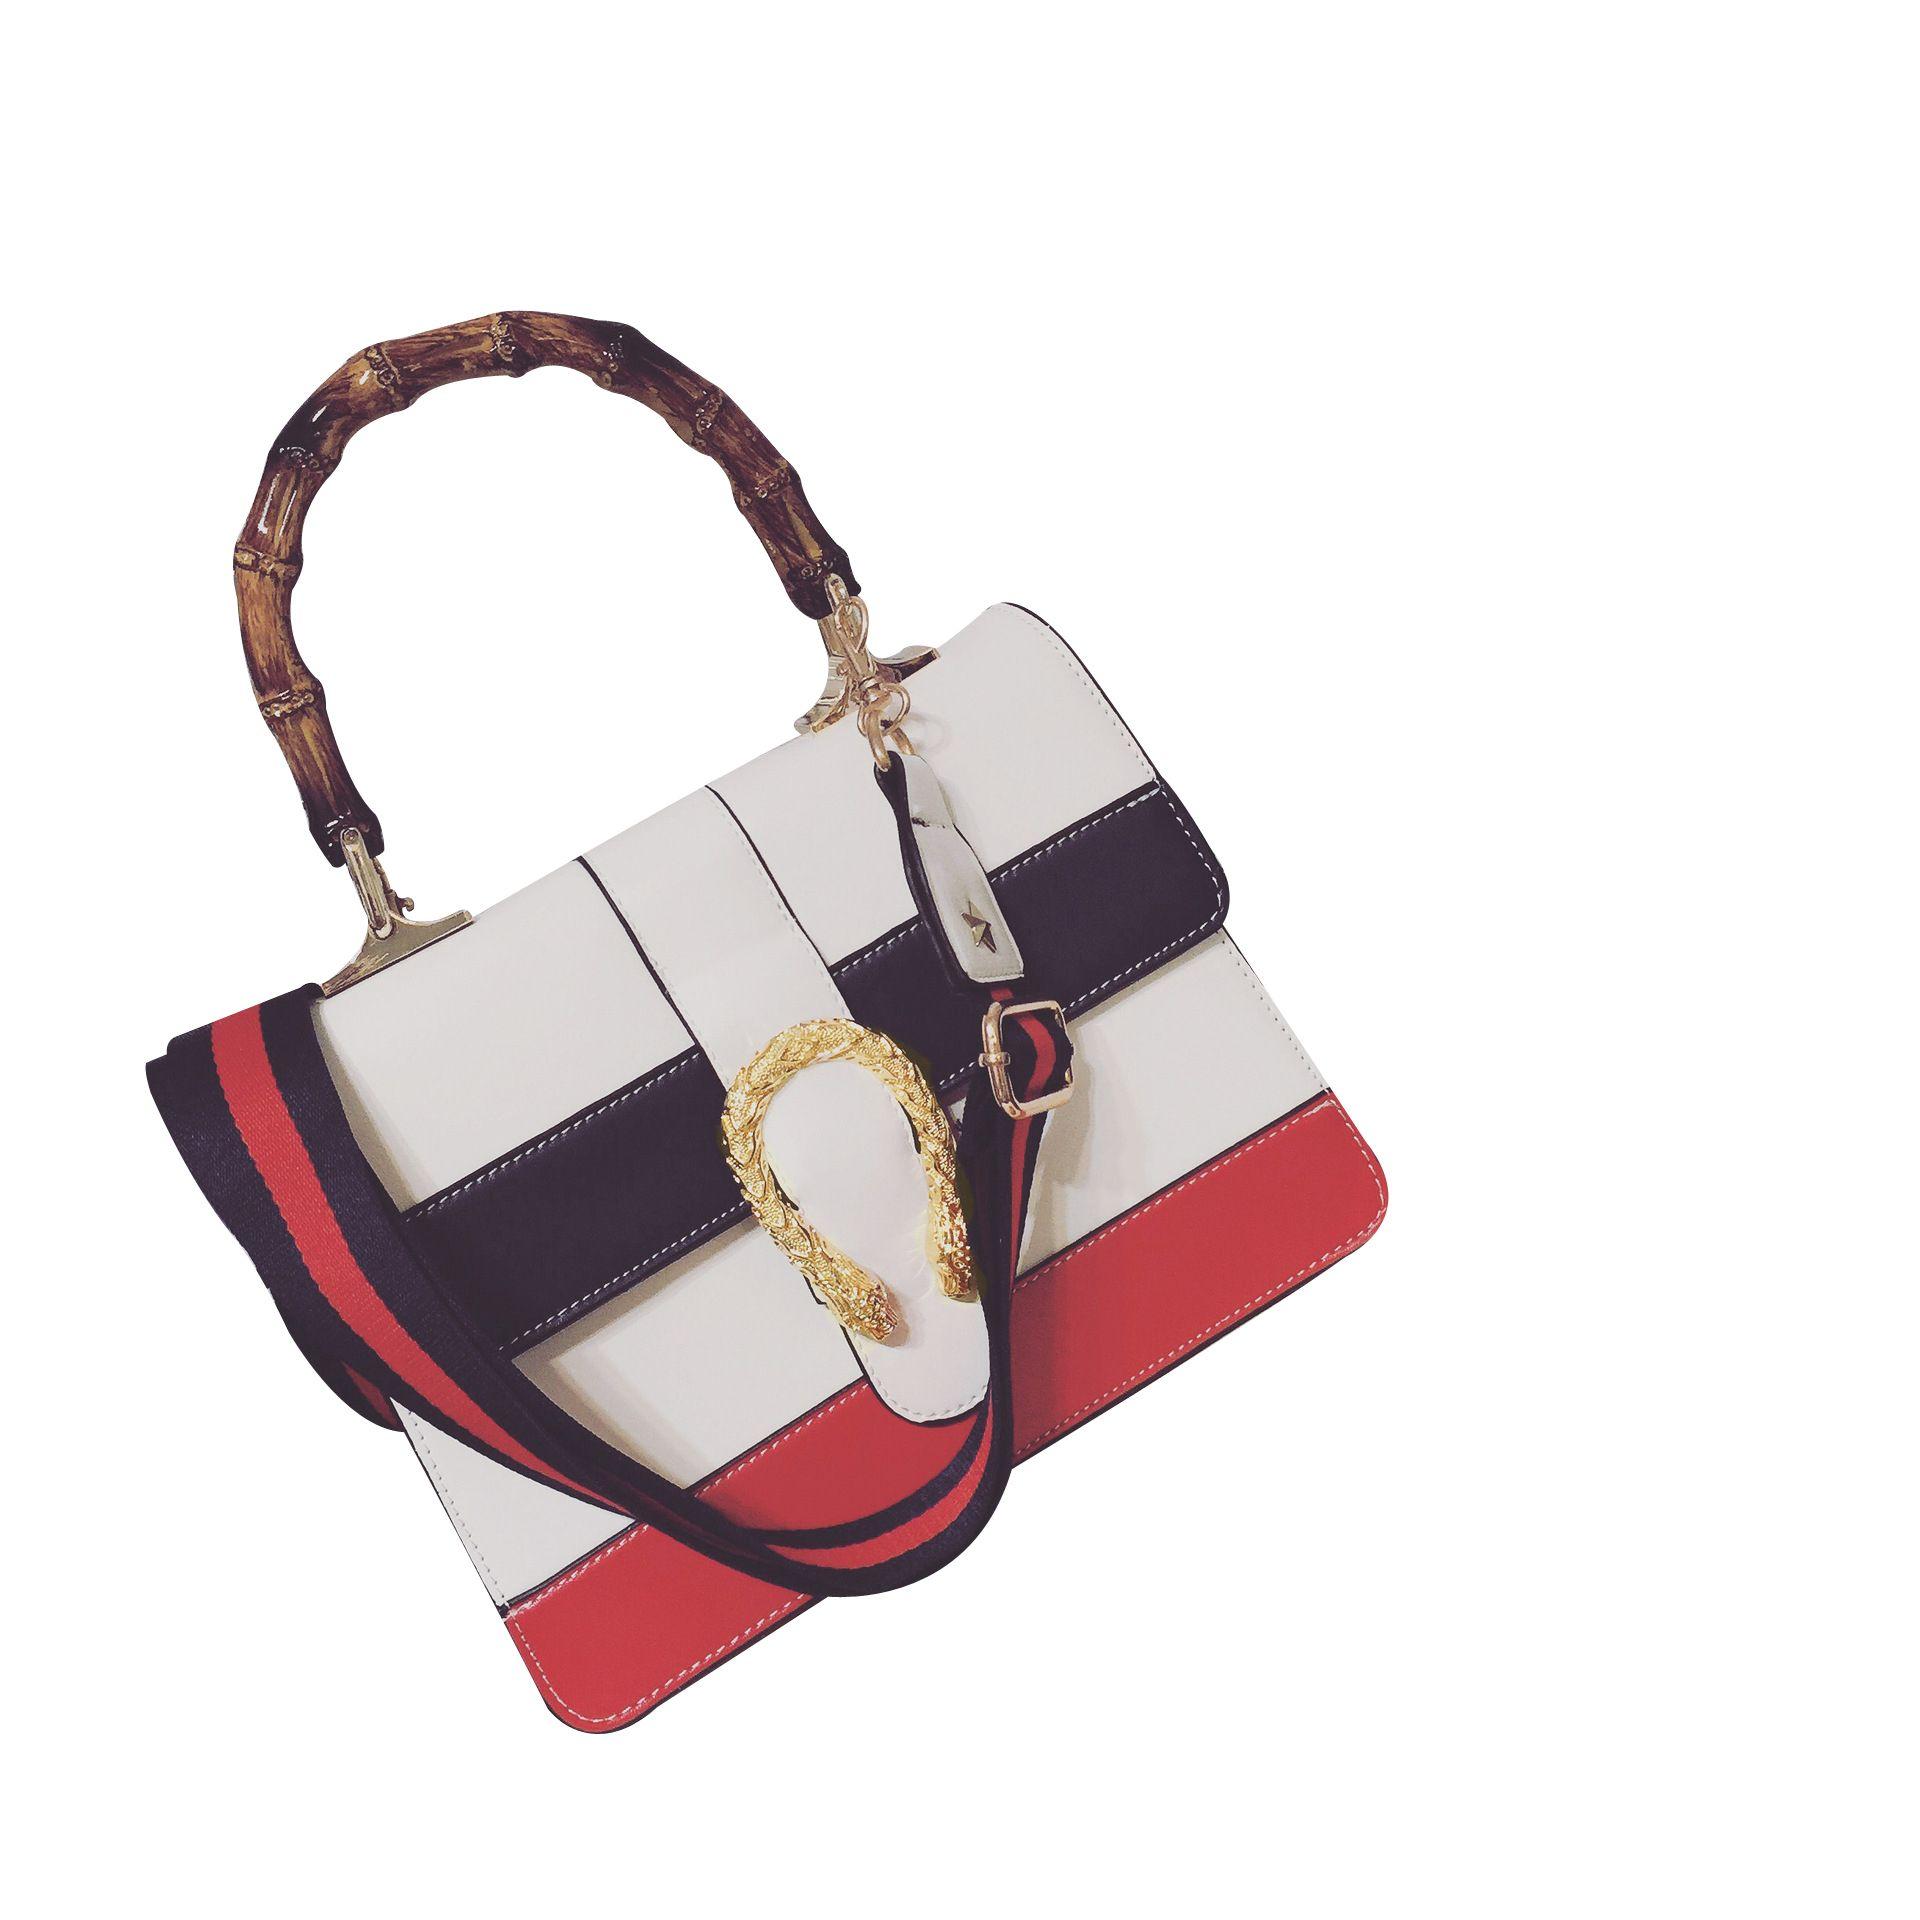 $29.90 (Buy here: https://alitems.com/g/1e8d114494ebda23ff8b16525dc3e8/?i=5&ulp=https%3A%2F%2Fwww.aliexpress.com%2Fitem%2FFamous-brand-handbags-2016-new-catwalk-models-Bacchus-handbag-navy-stripes-of-red-and-white-stitching%2F32690985306.html ) Famous brand handbags 2016 new catwalk models Bacchus handbag navy stripes of red and white stitching Mobile Messenger bag for just $29.90